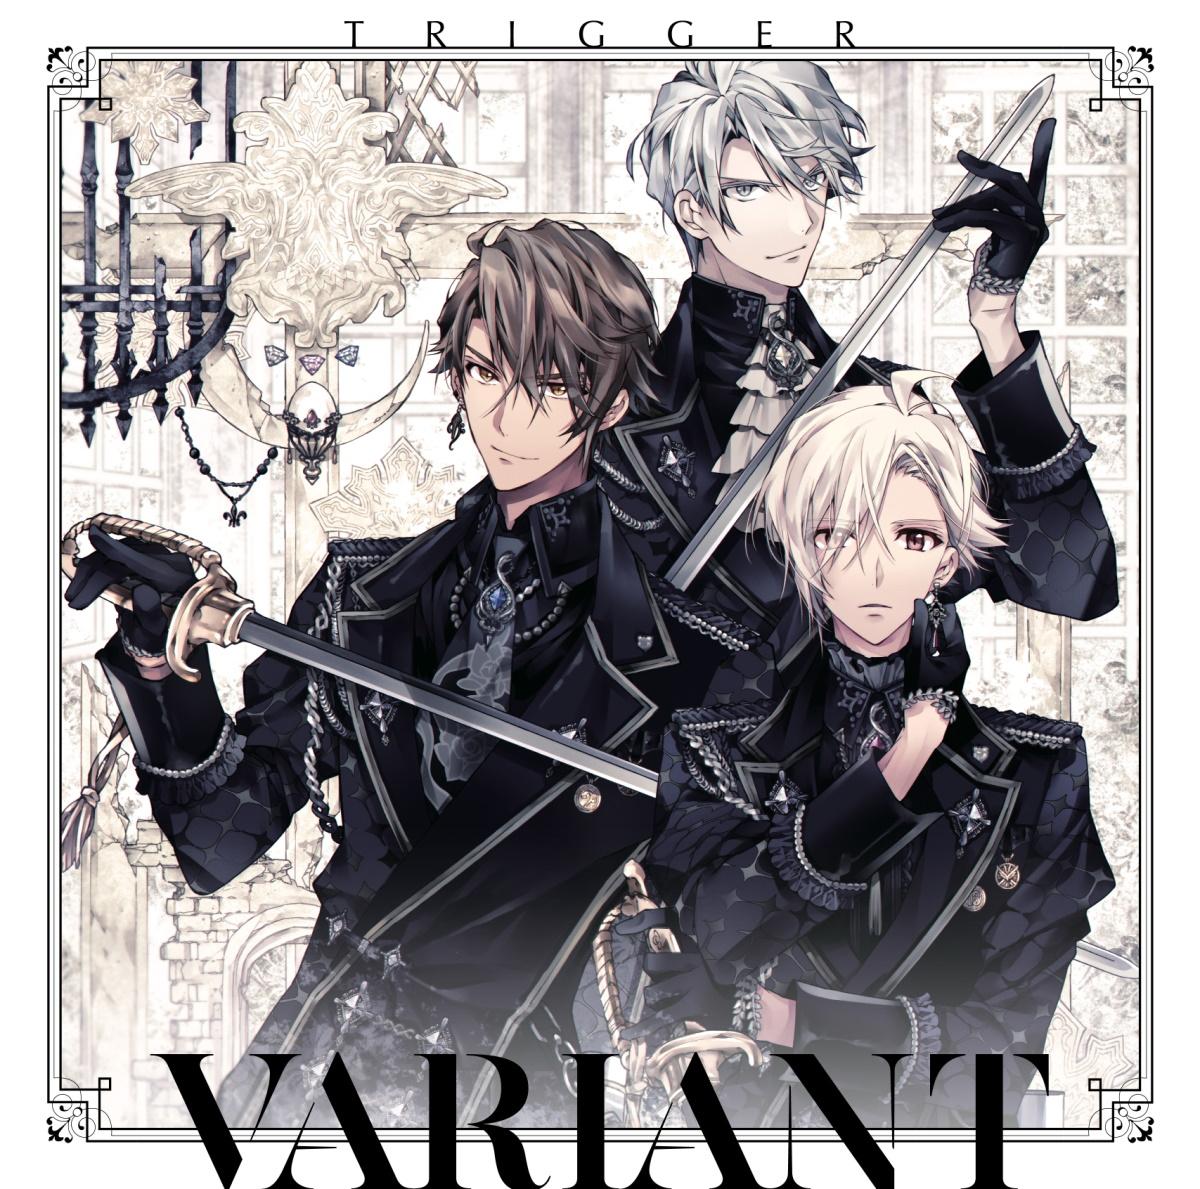 『TRIGGER - VALIANT』収録の『VARIANT』ジャケット